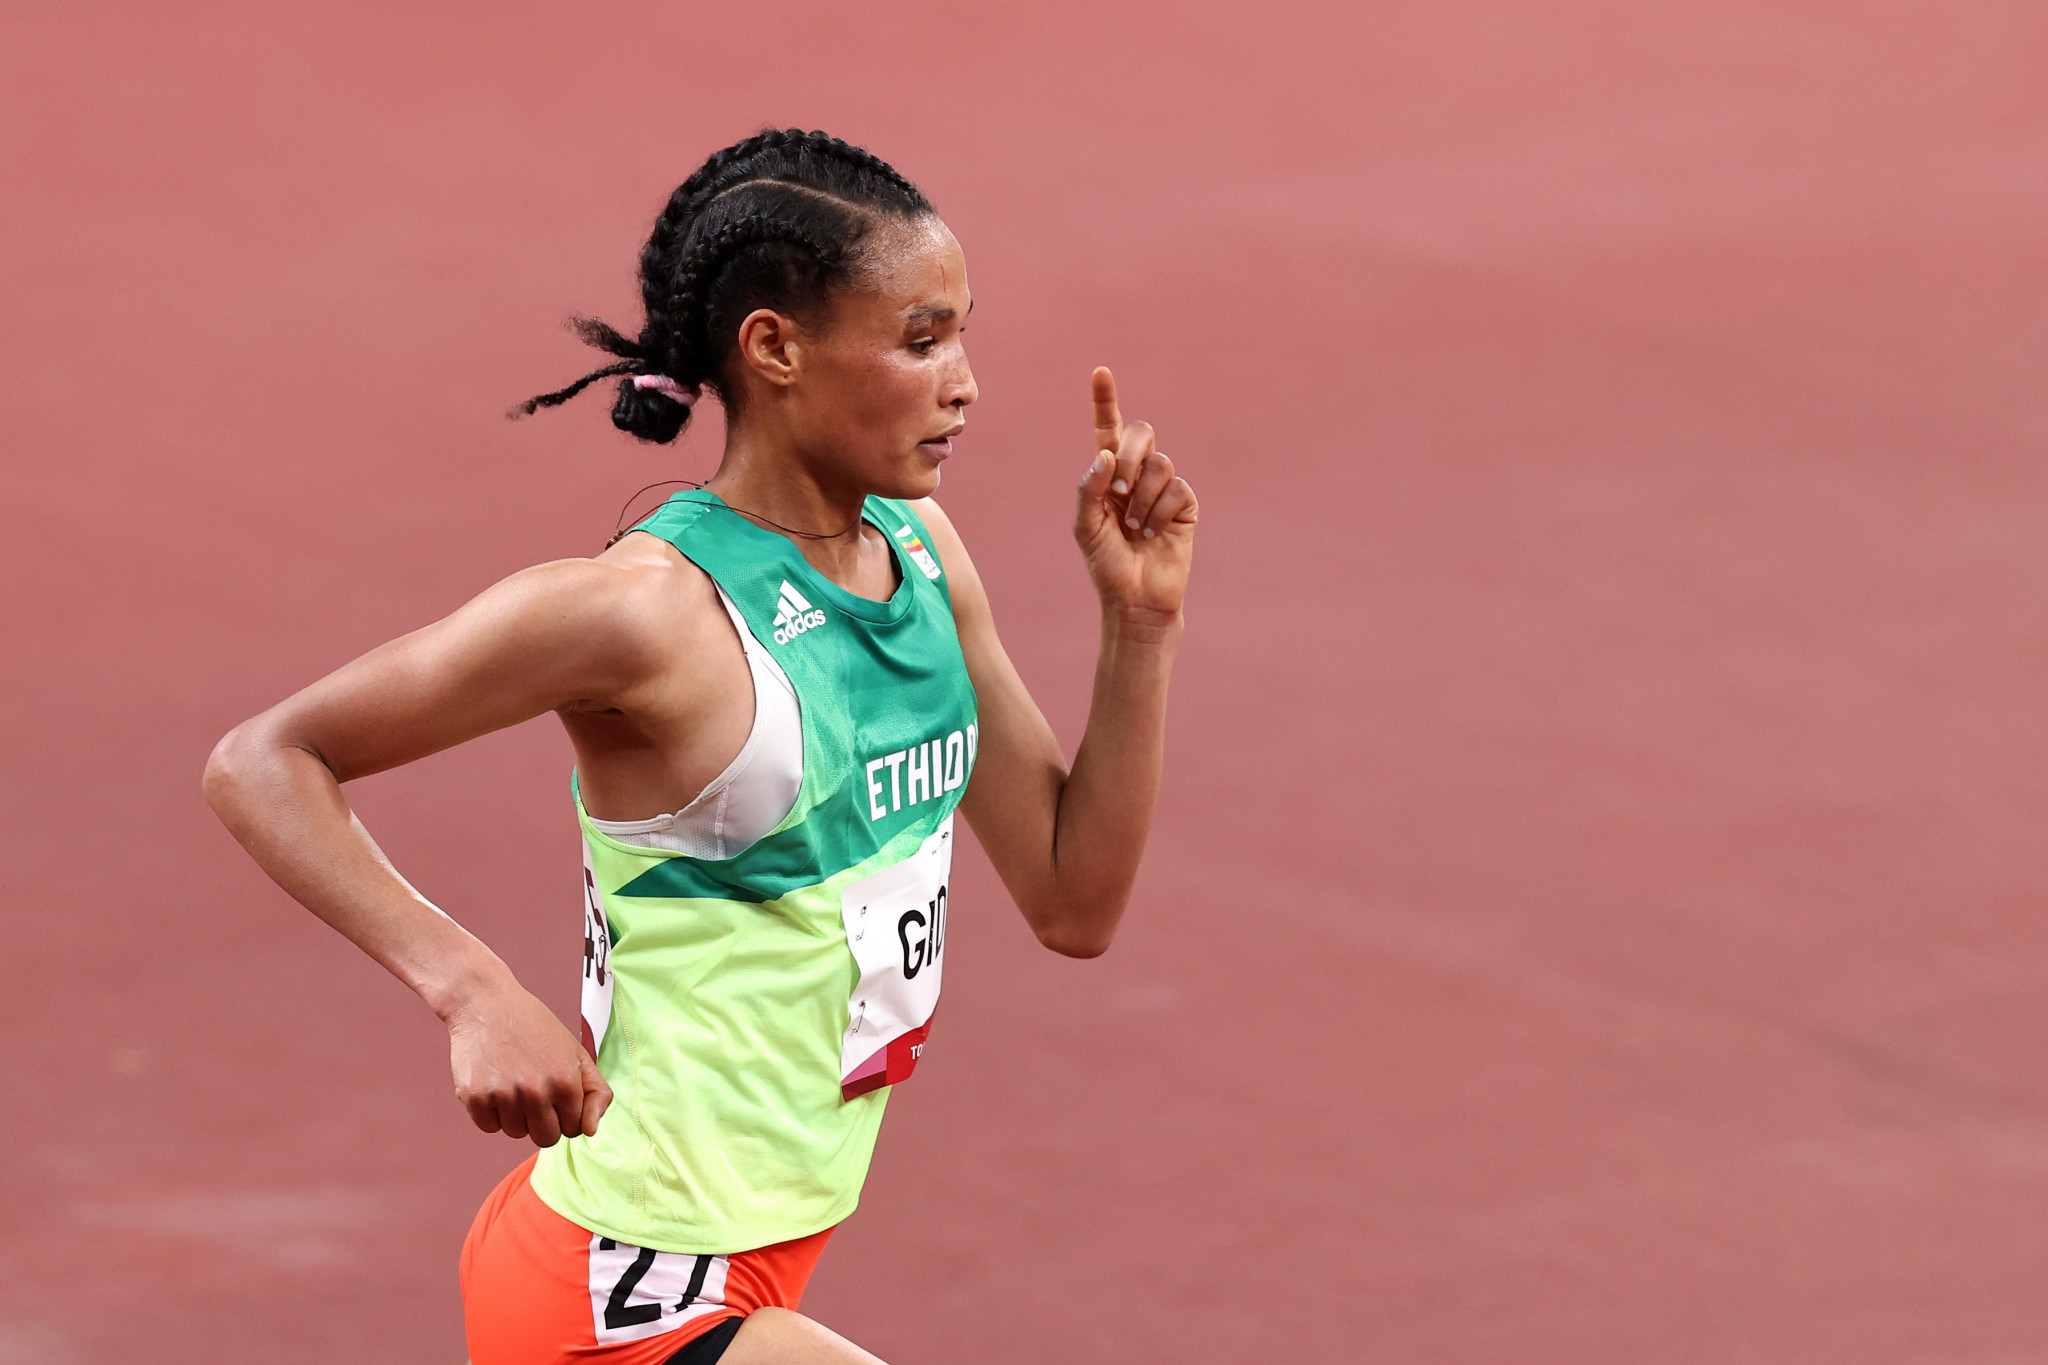 Gidey smashes half marathon world record on distance debut in Valencia